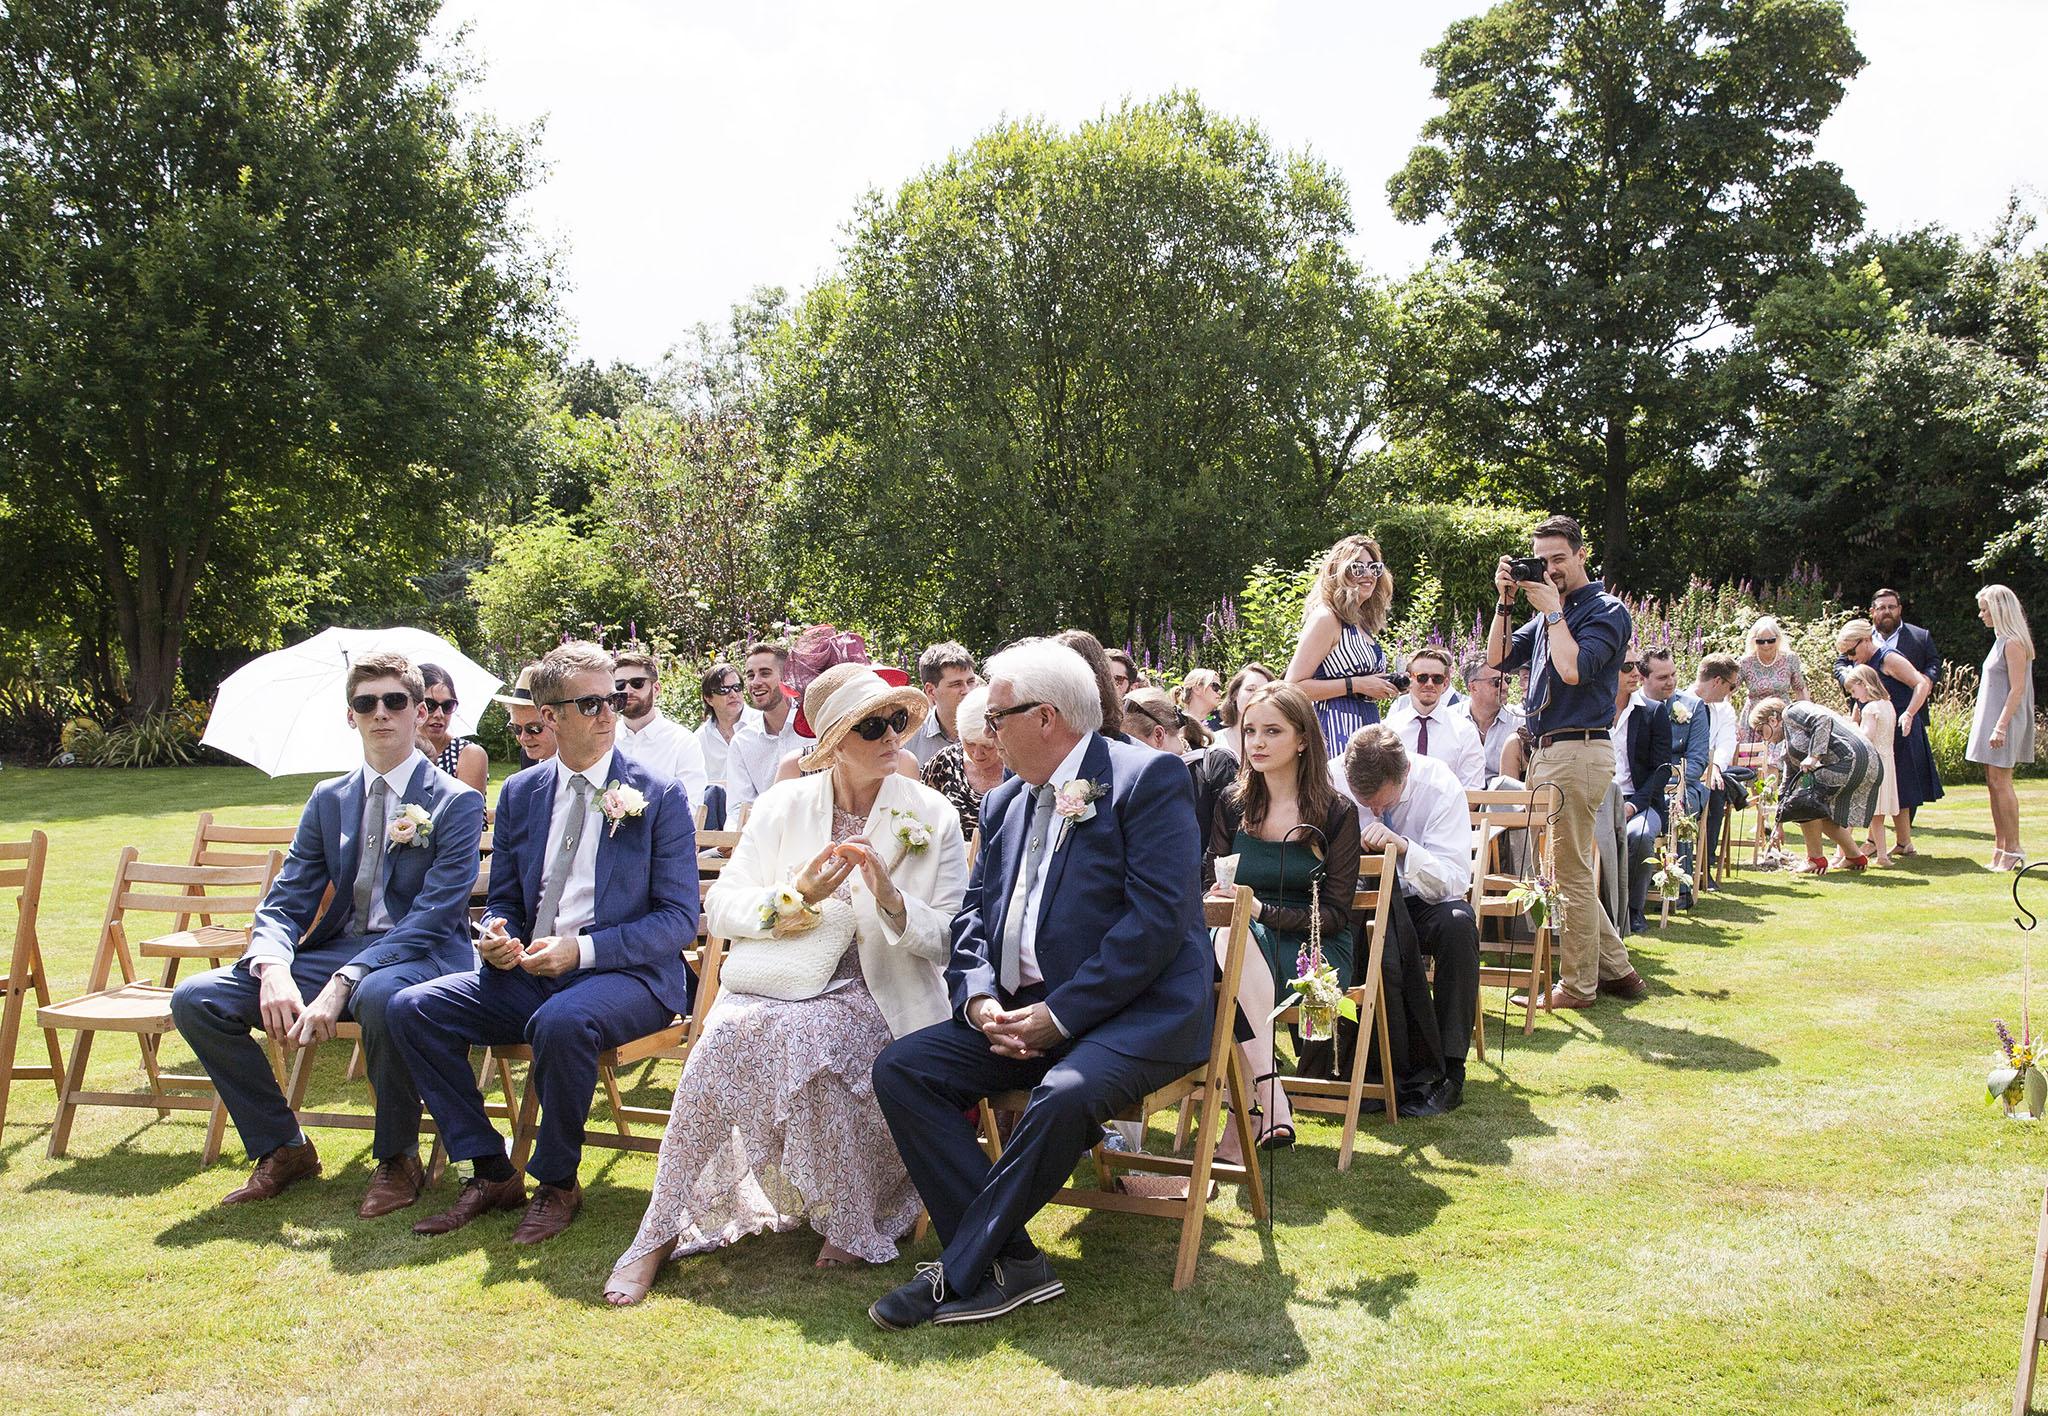 elizabethgphotography_kingslangley_hertfordshire_fineart_wedding_pottersbar_matt_katie_pegg_19.jpg